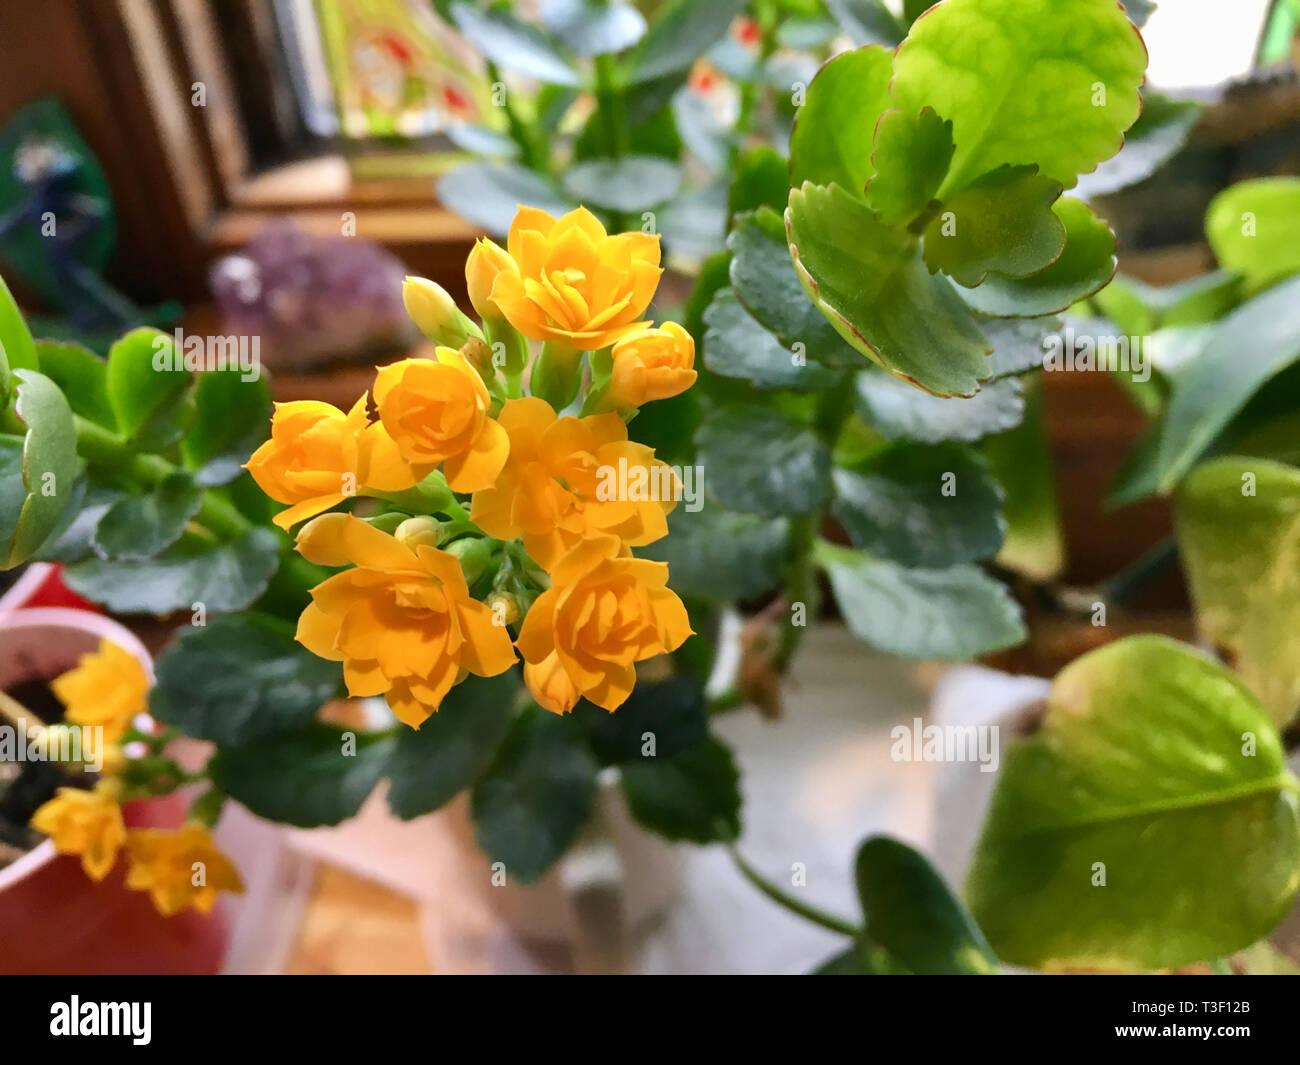 Flowers On Kitchen Window Sill Stock Photos Amp Flowers On